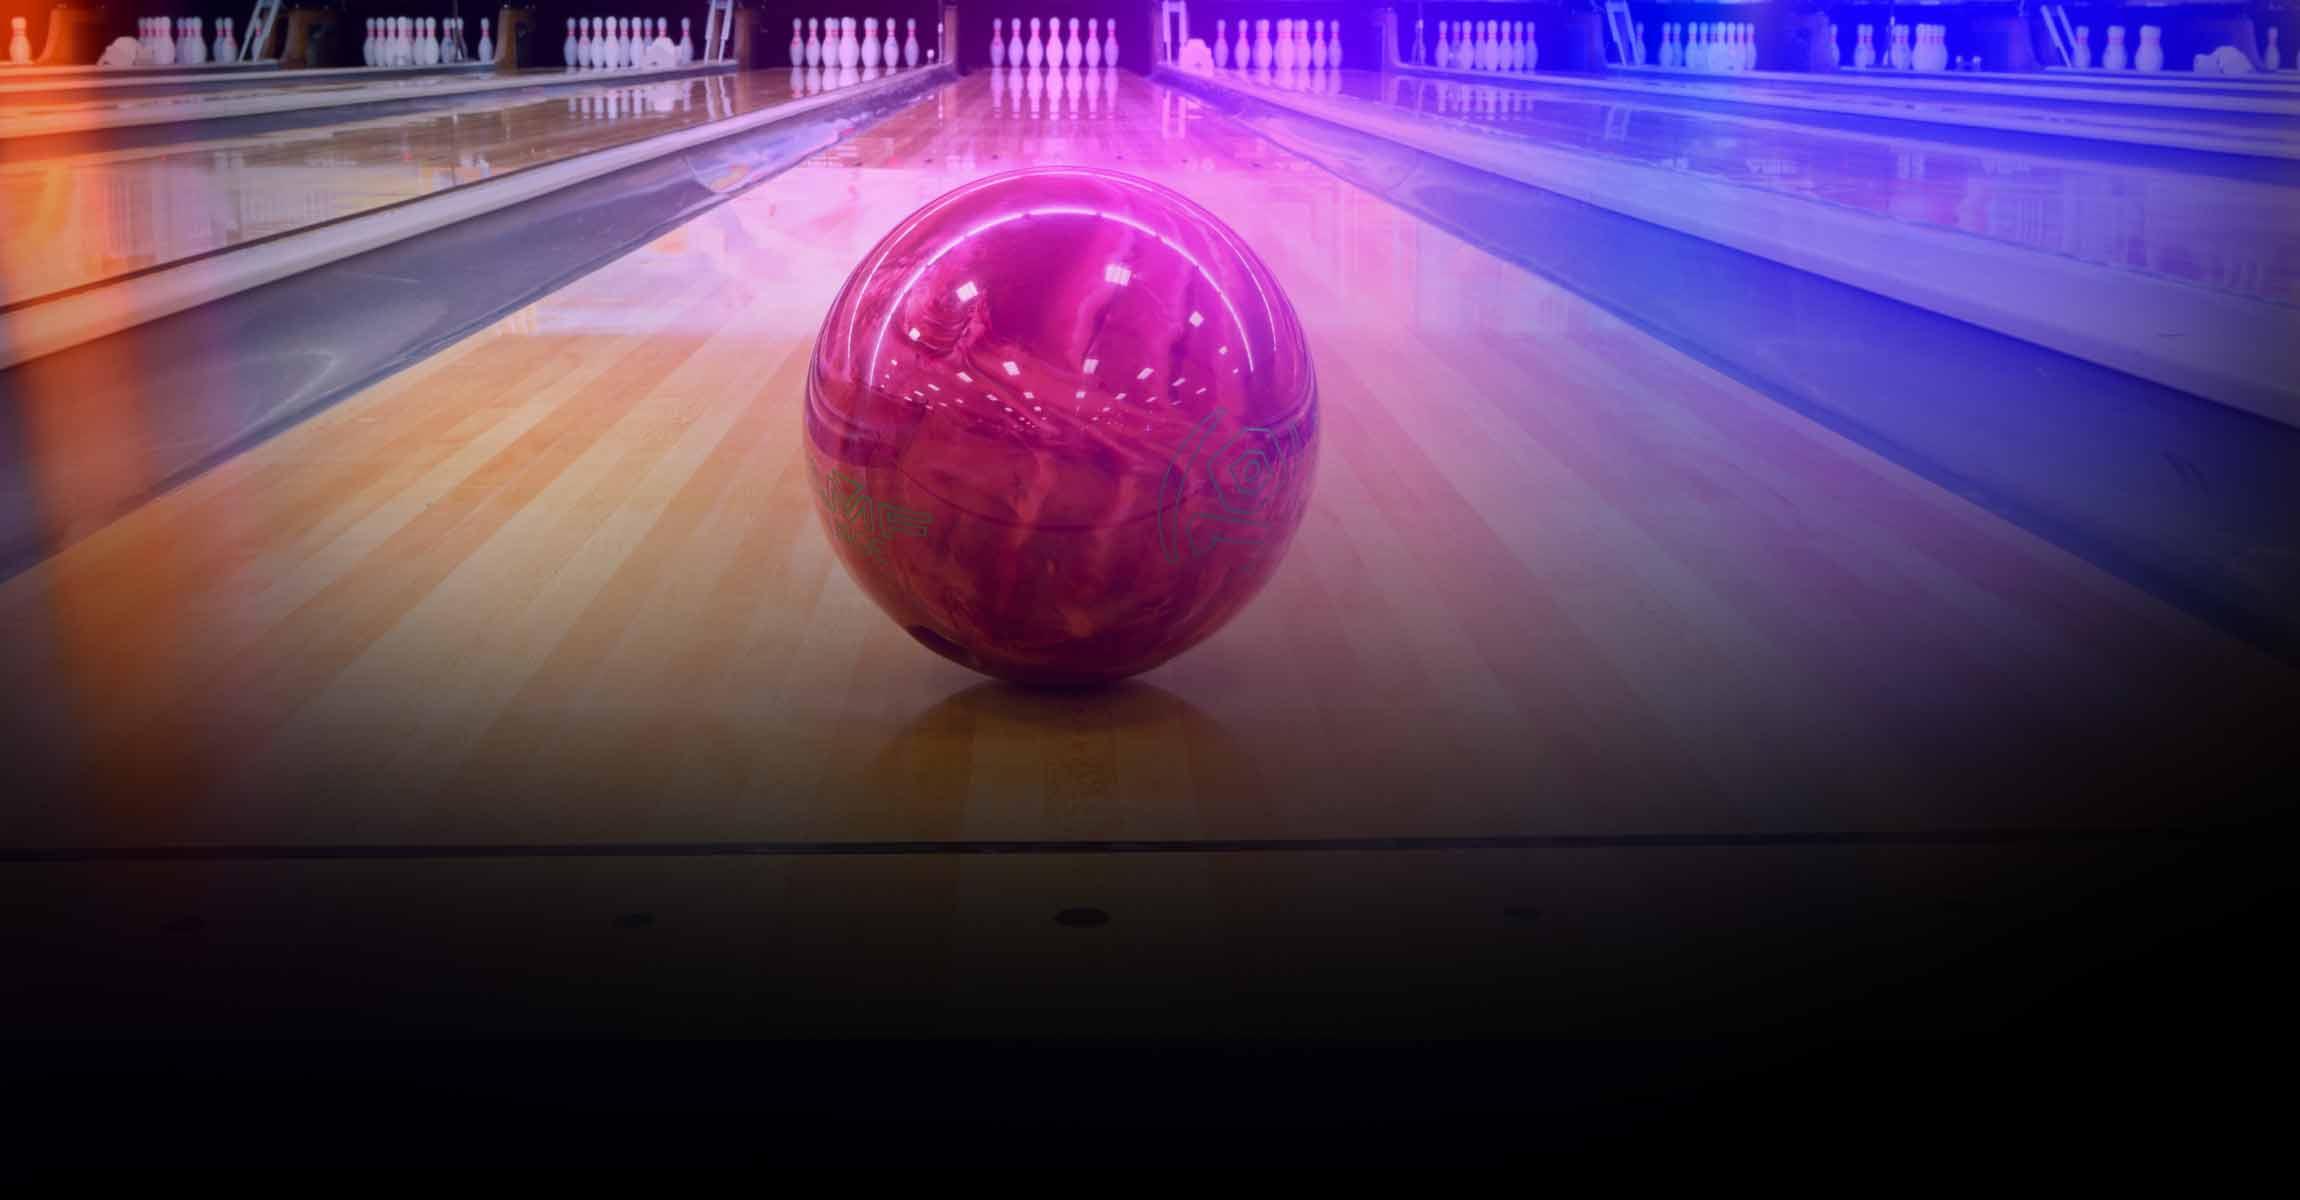 Bowling Alleys Amf Bowling Amf Keglers Lanes